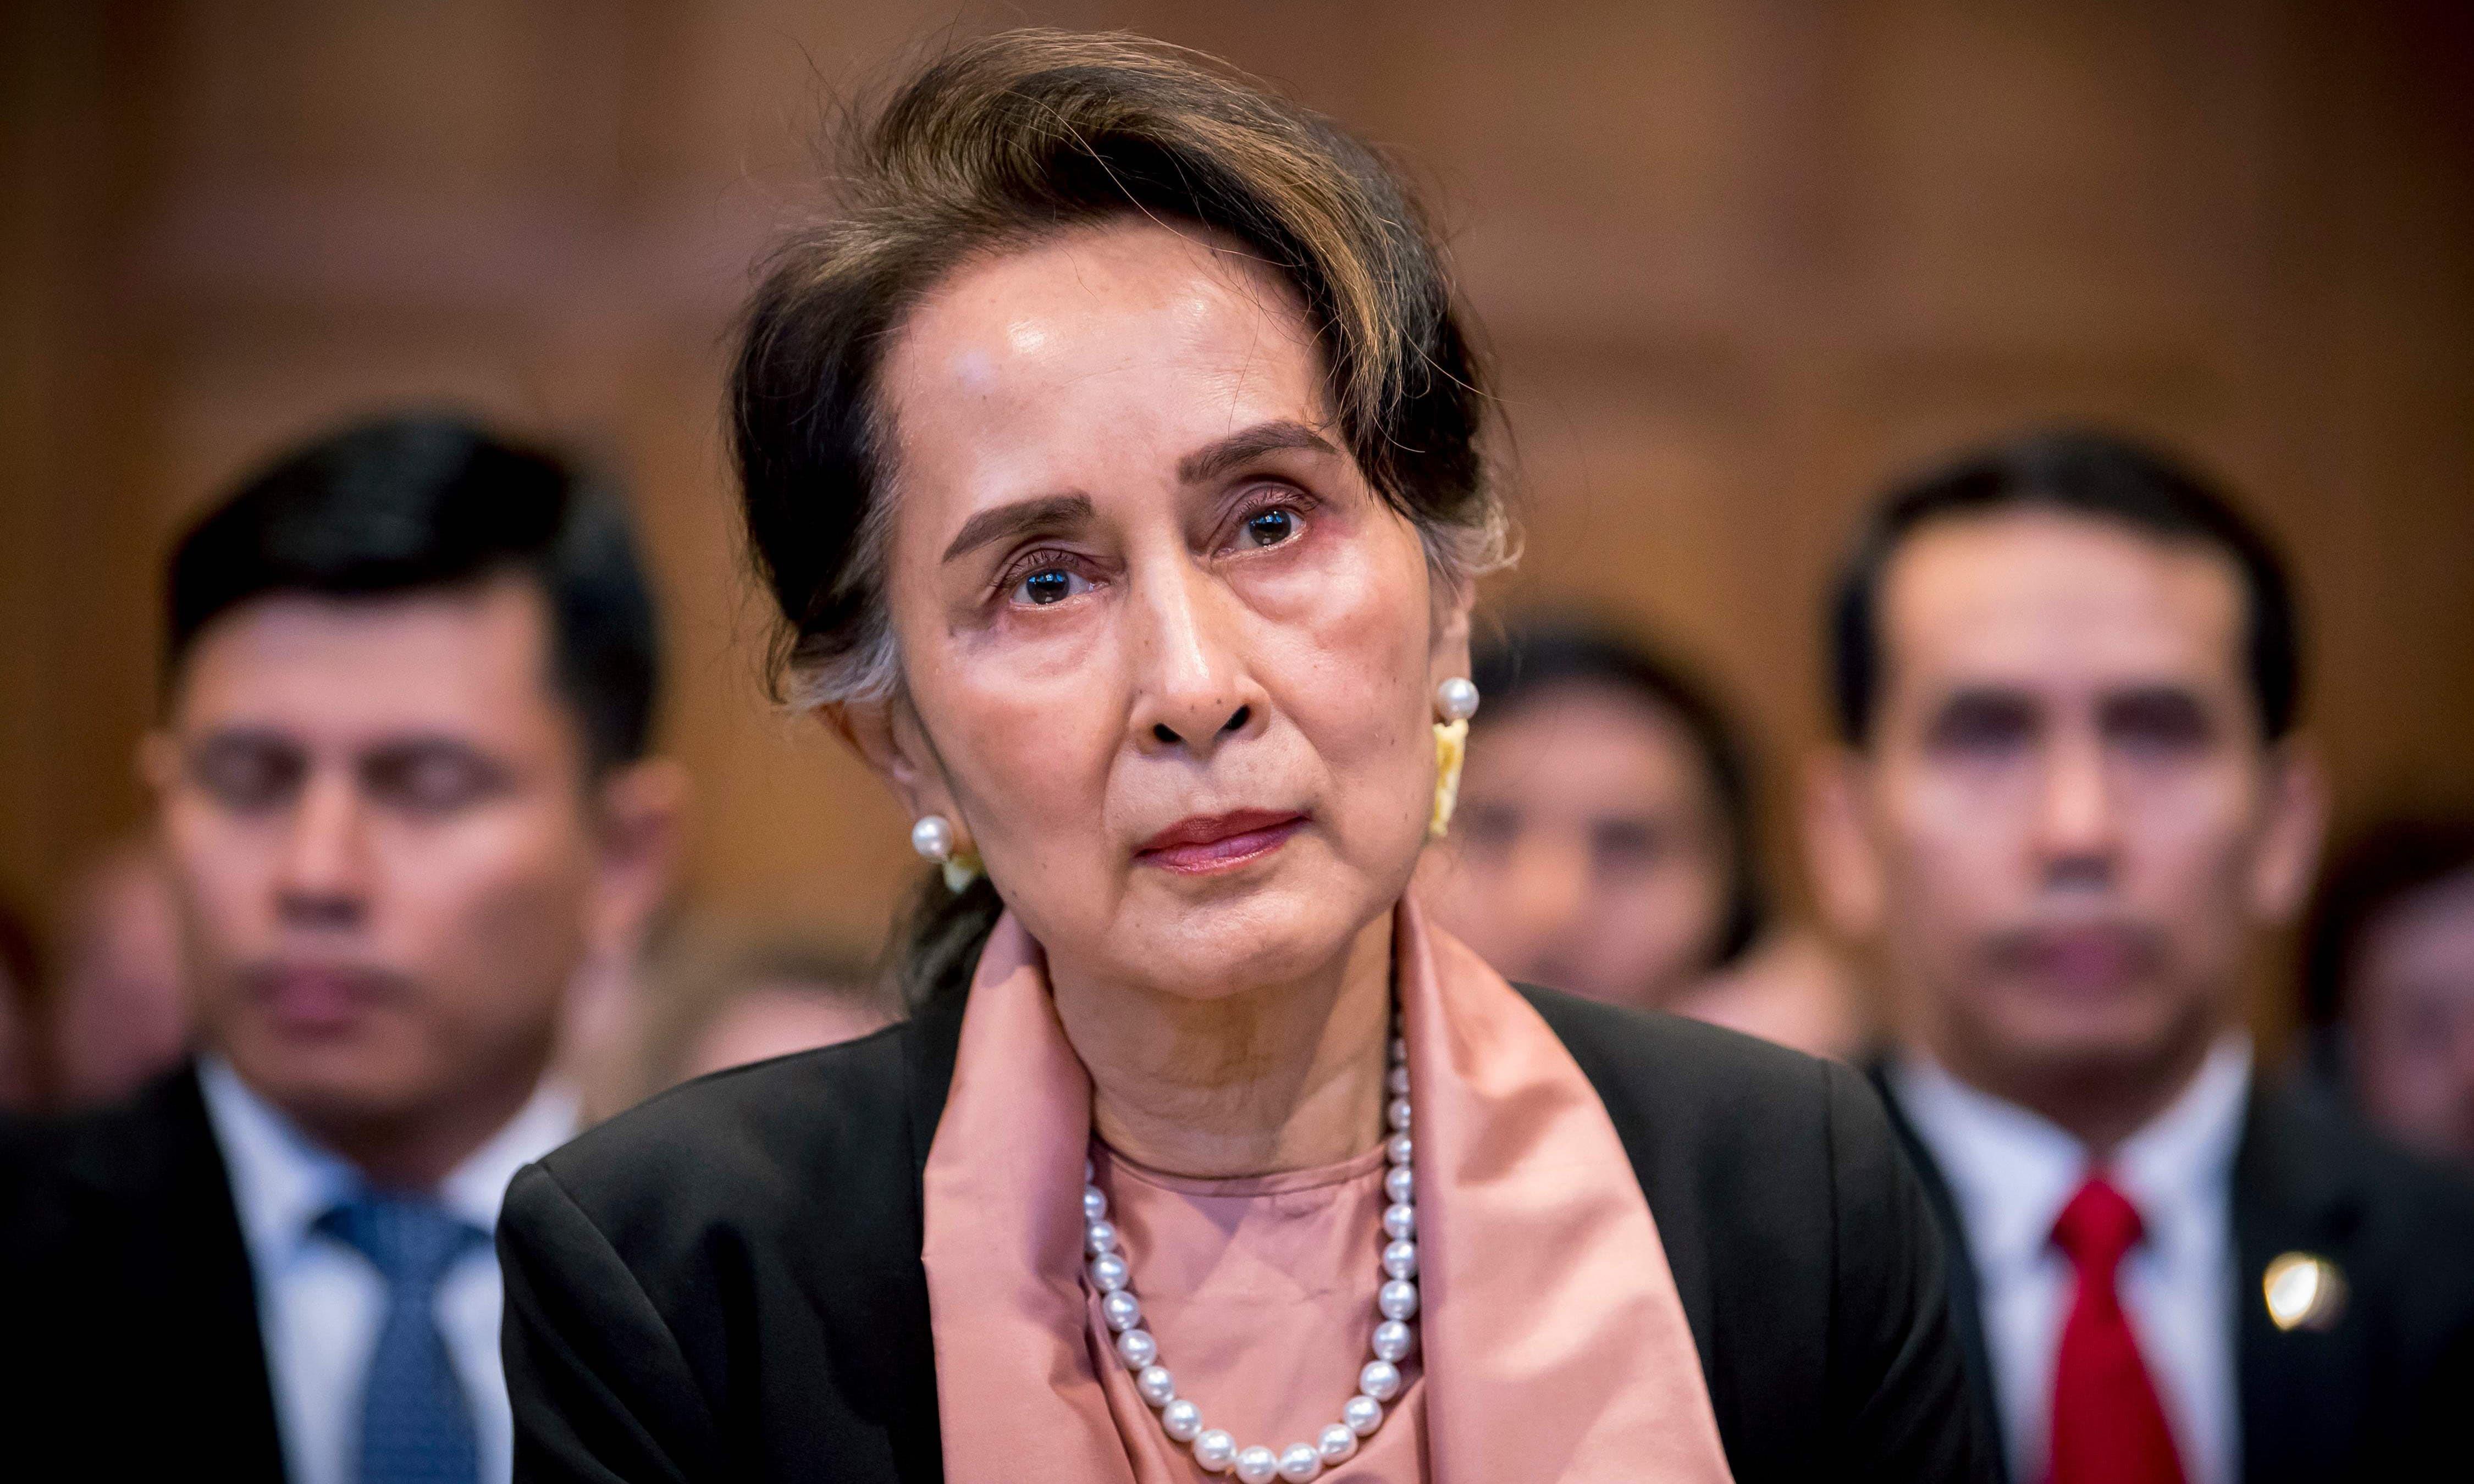 Myanmar military seizes power, detains elected leader Aung San Suu Kyi -  World - DAWN.COM